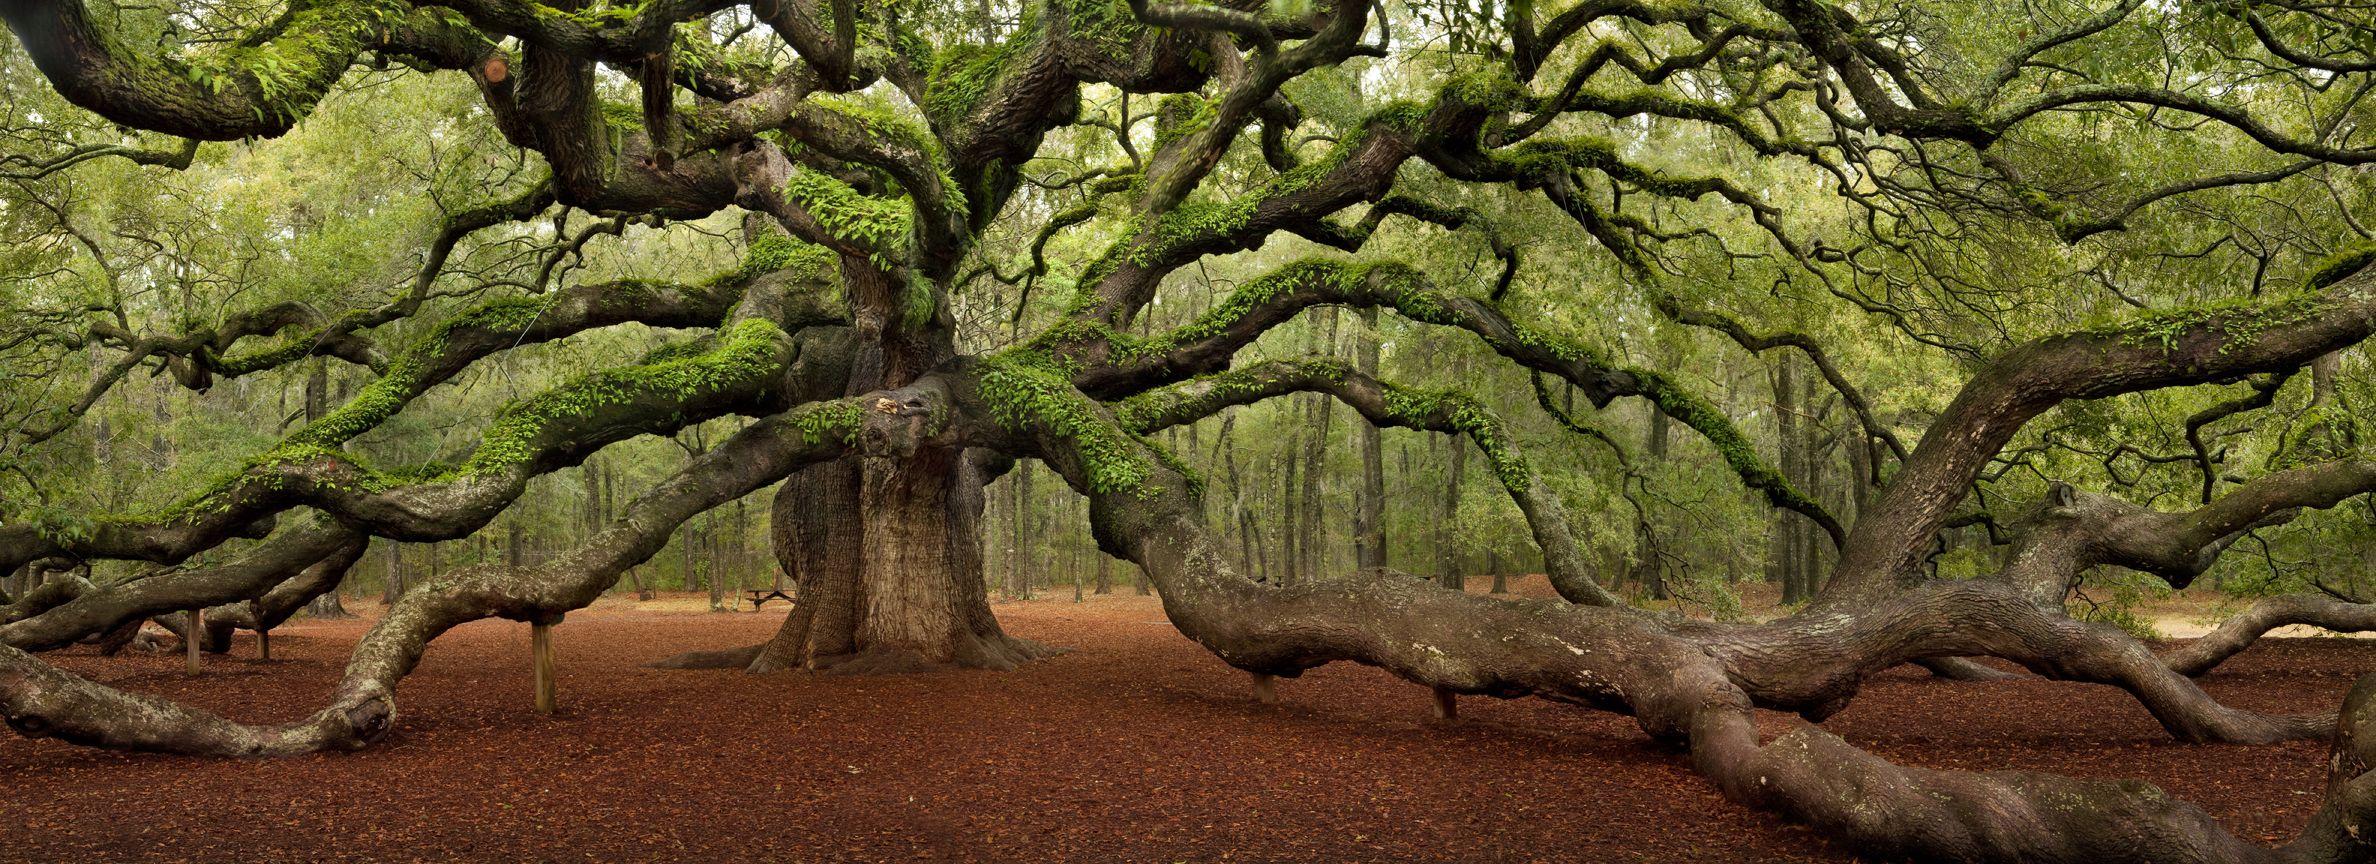 Angel Oak Tree (1500 years old), South Carolina